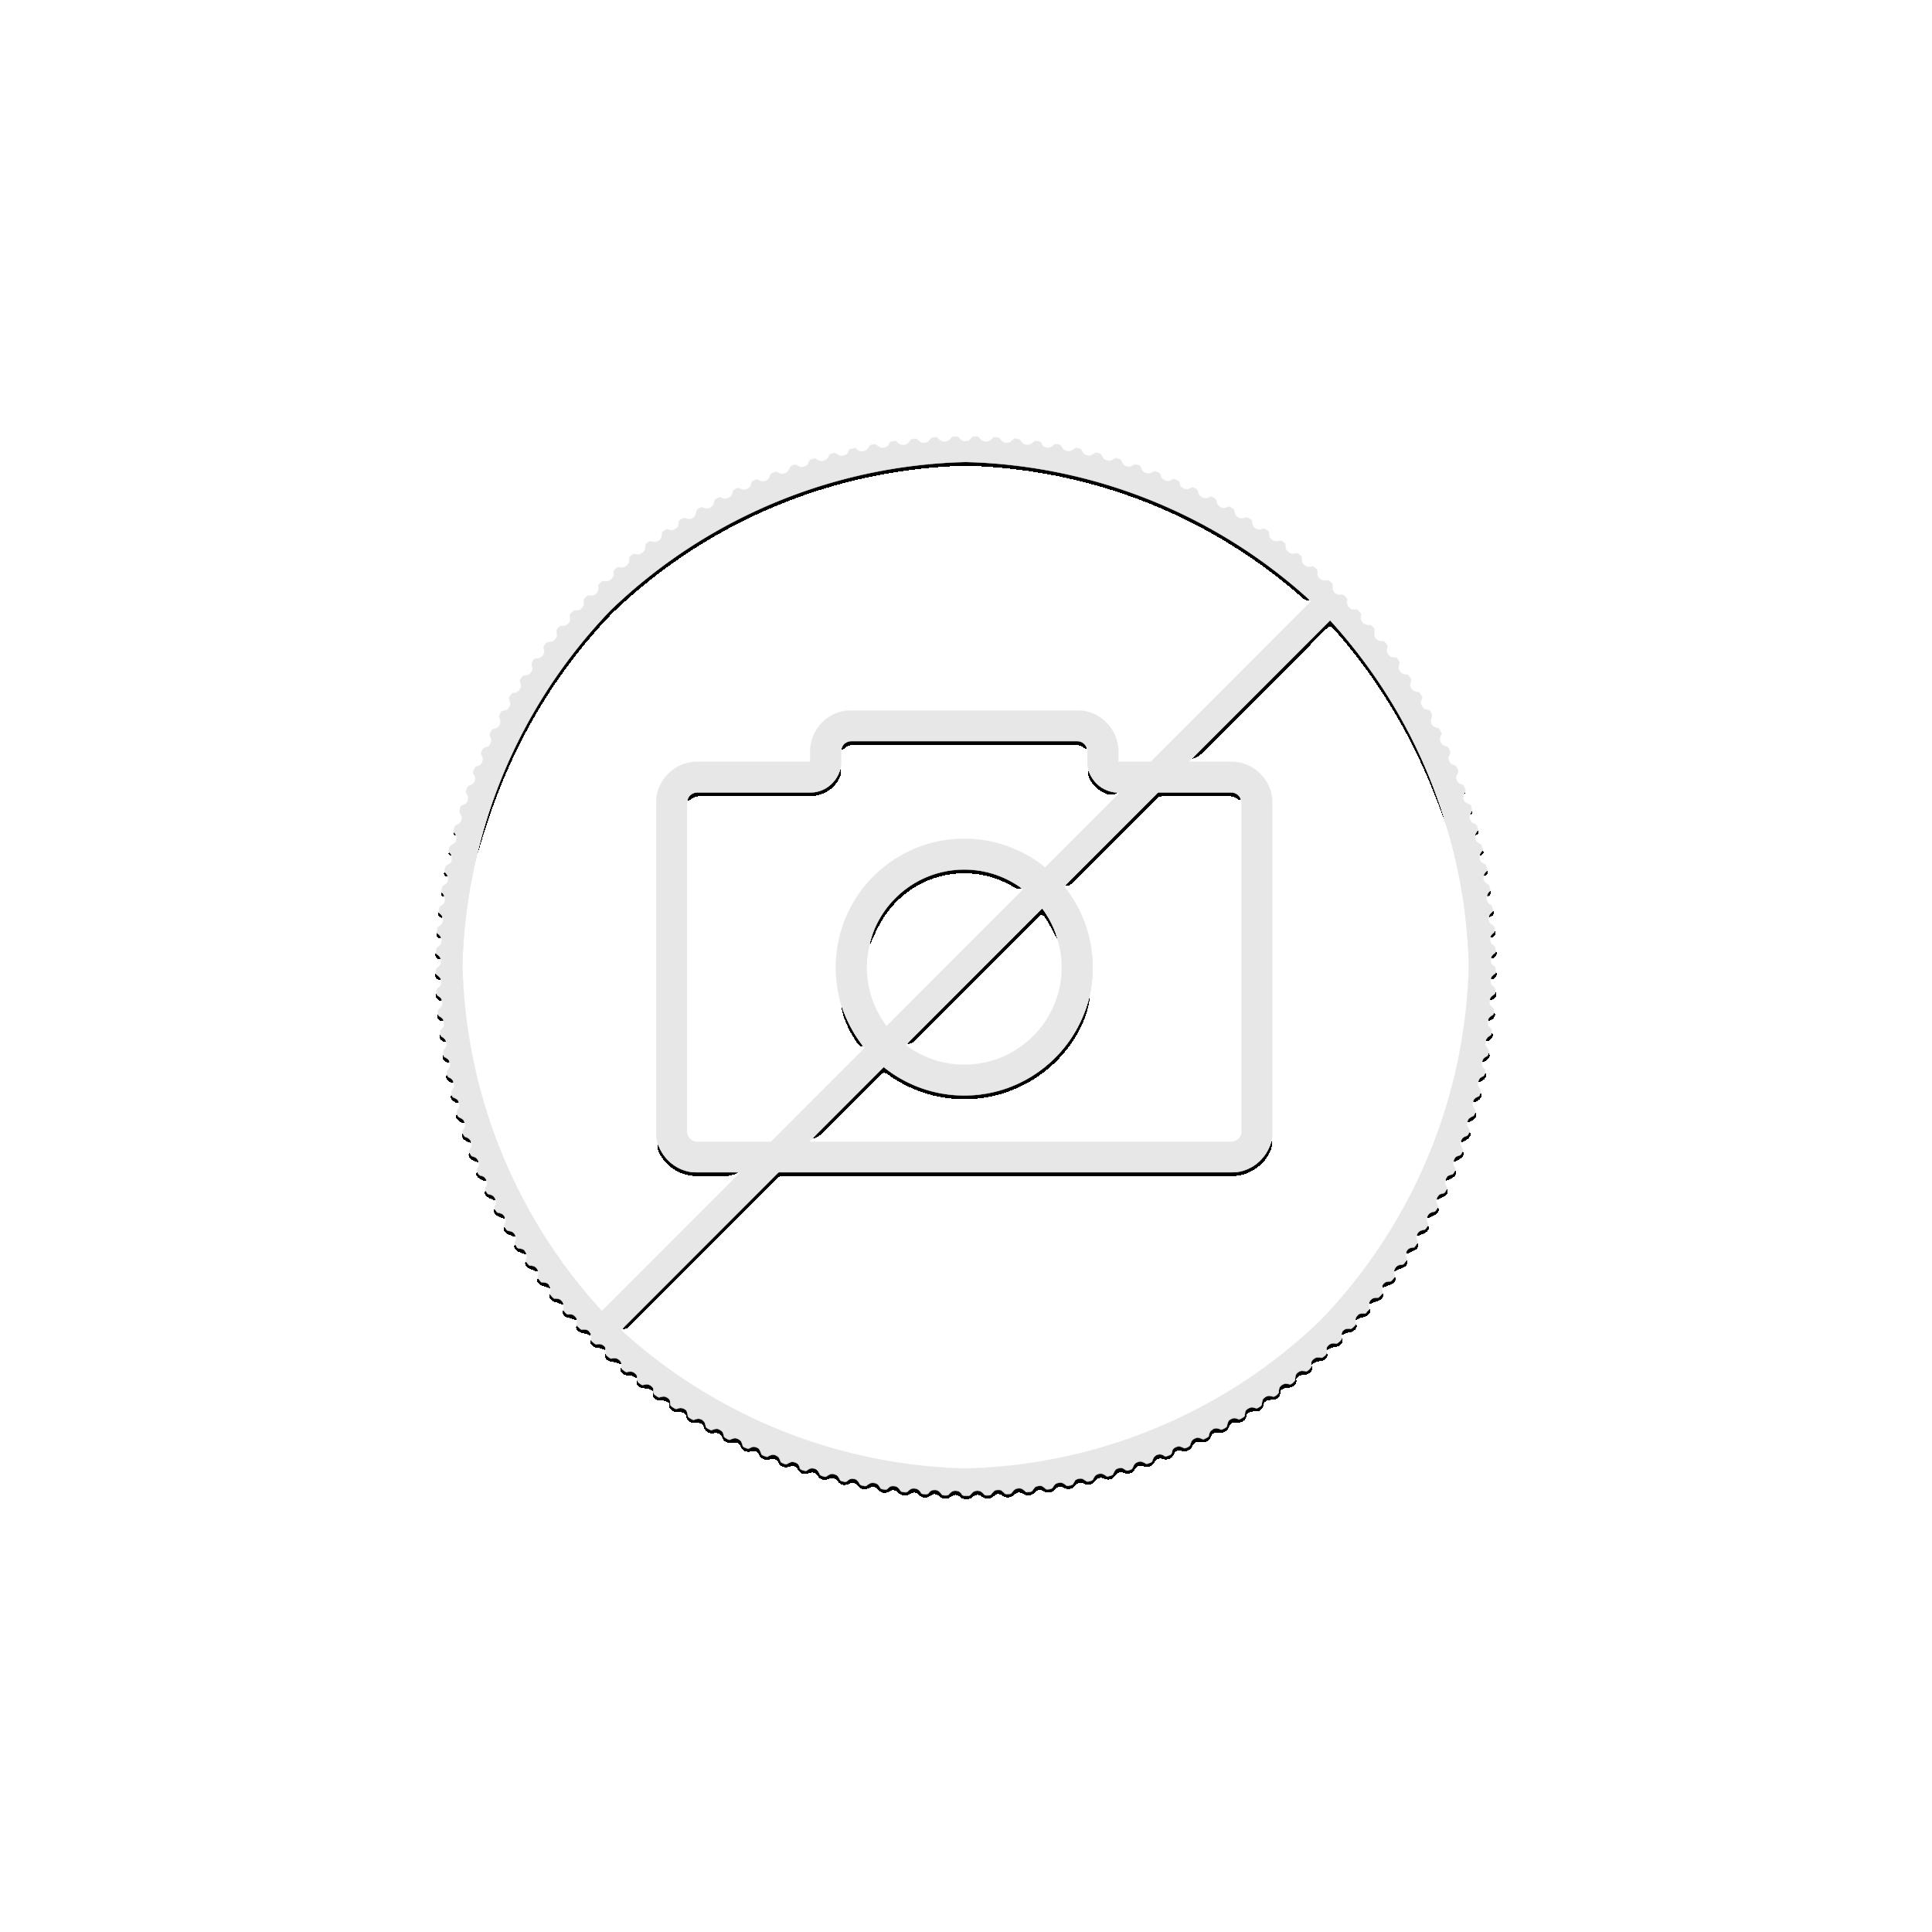 1 Kilo silver coin Kookaburra 2018